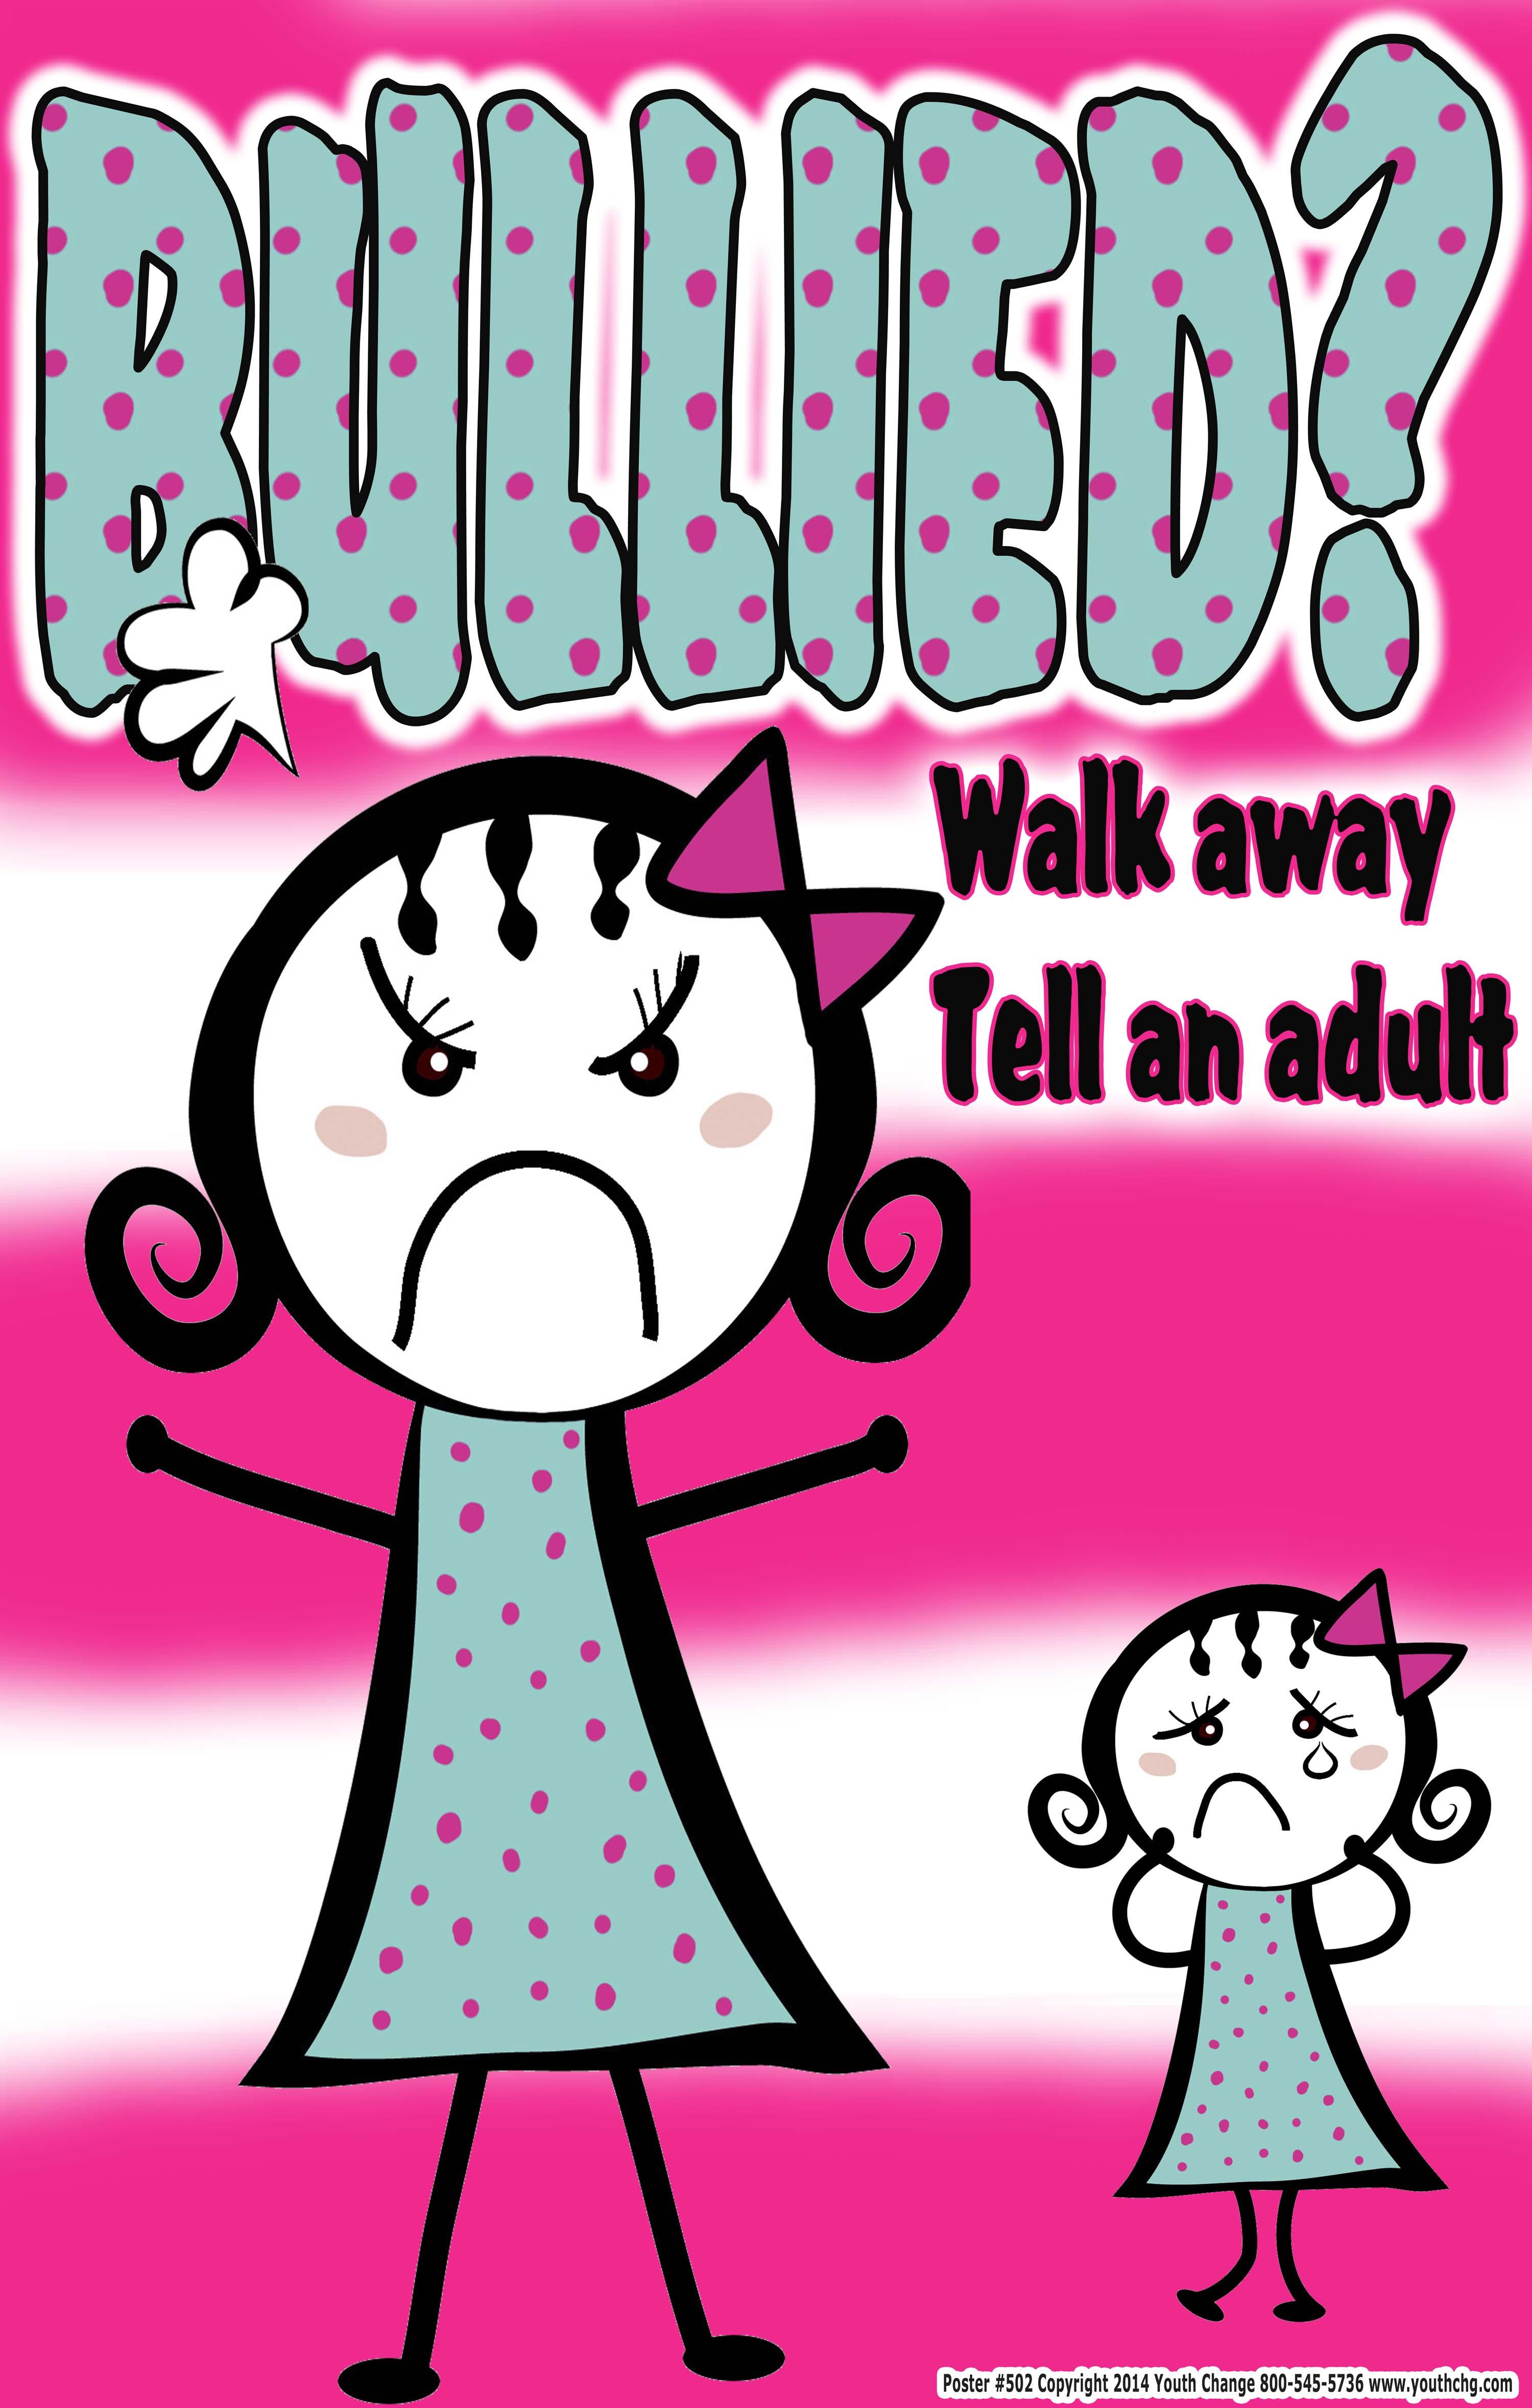 Library Of Help Prevent Bbullingbullying Svg Transparent